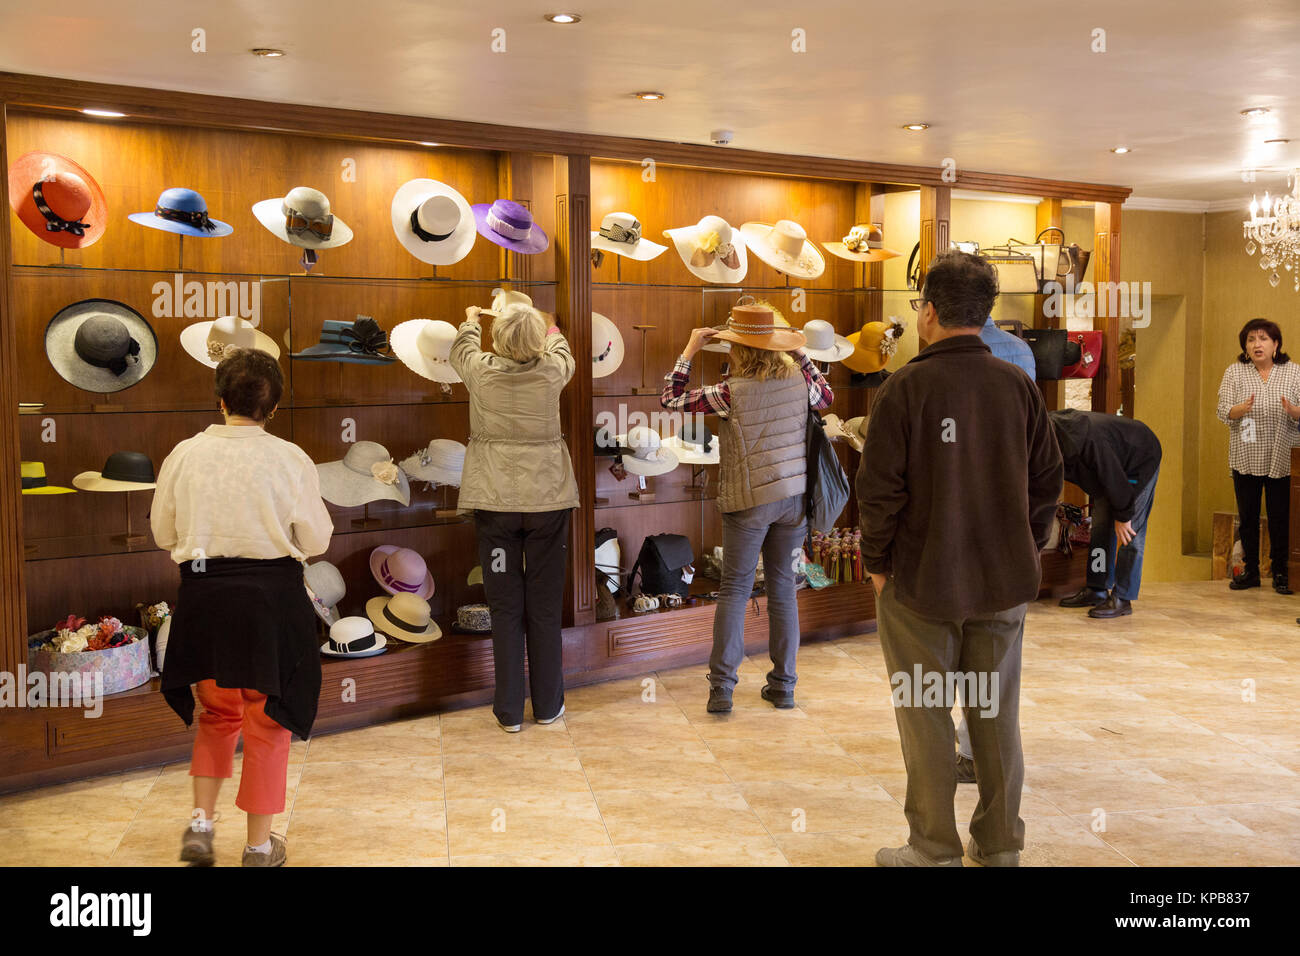 Panama Hat store - people buying panama hats 6fa32db82ef